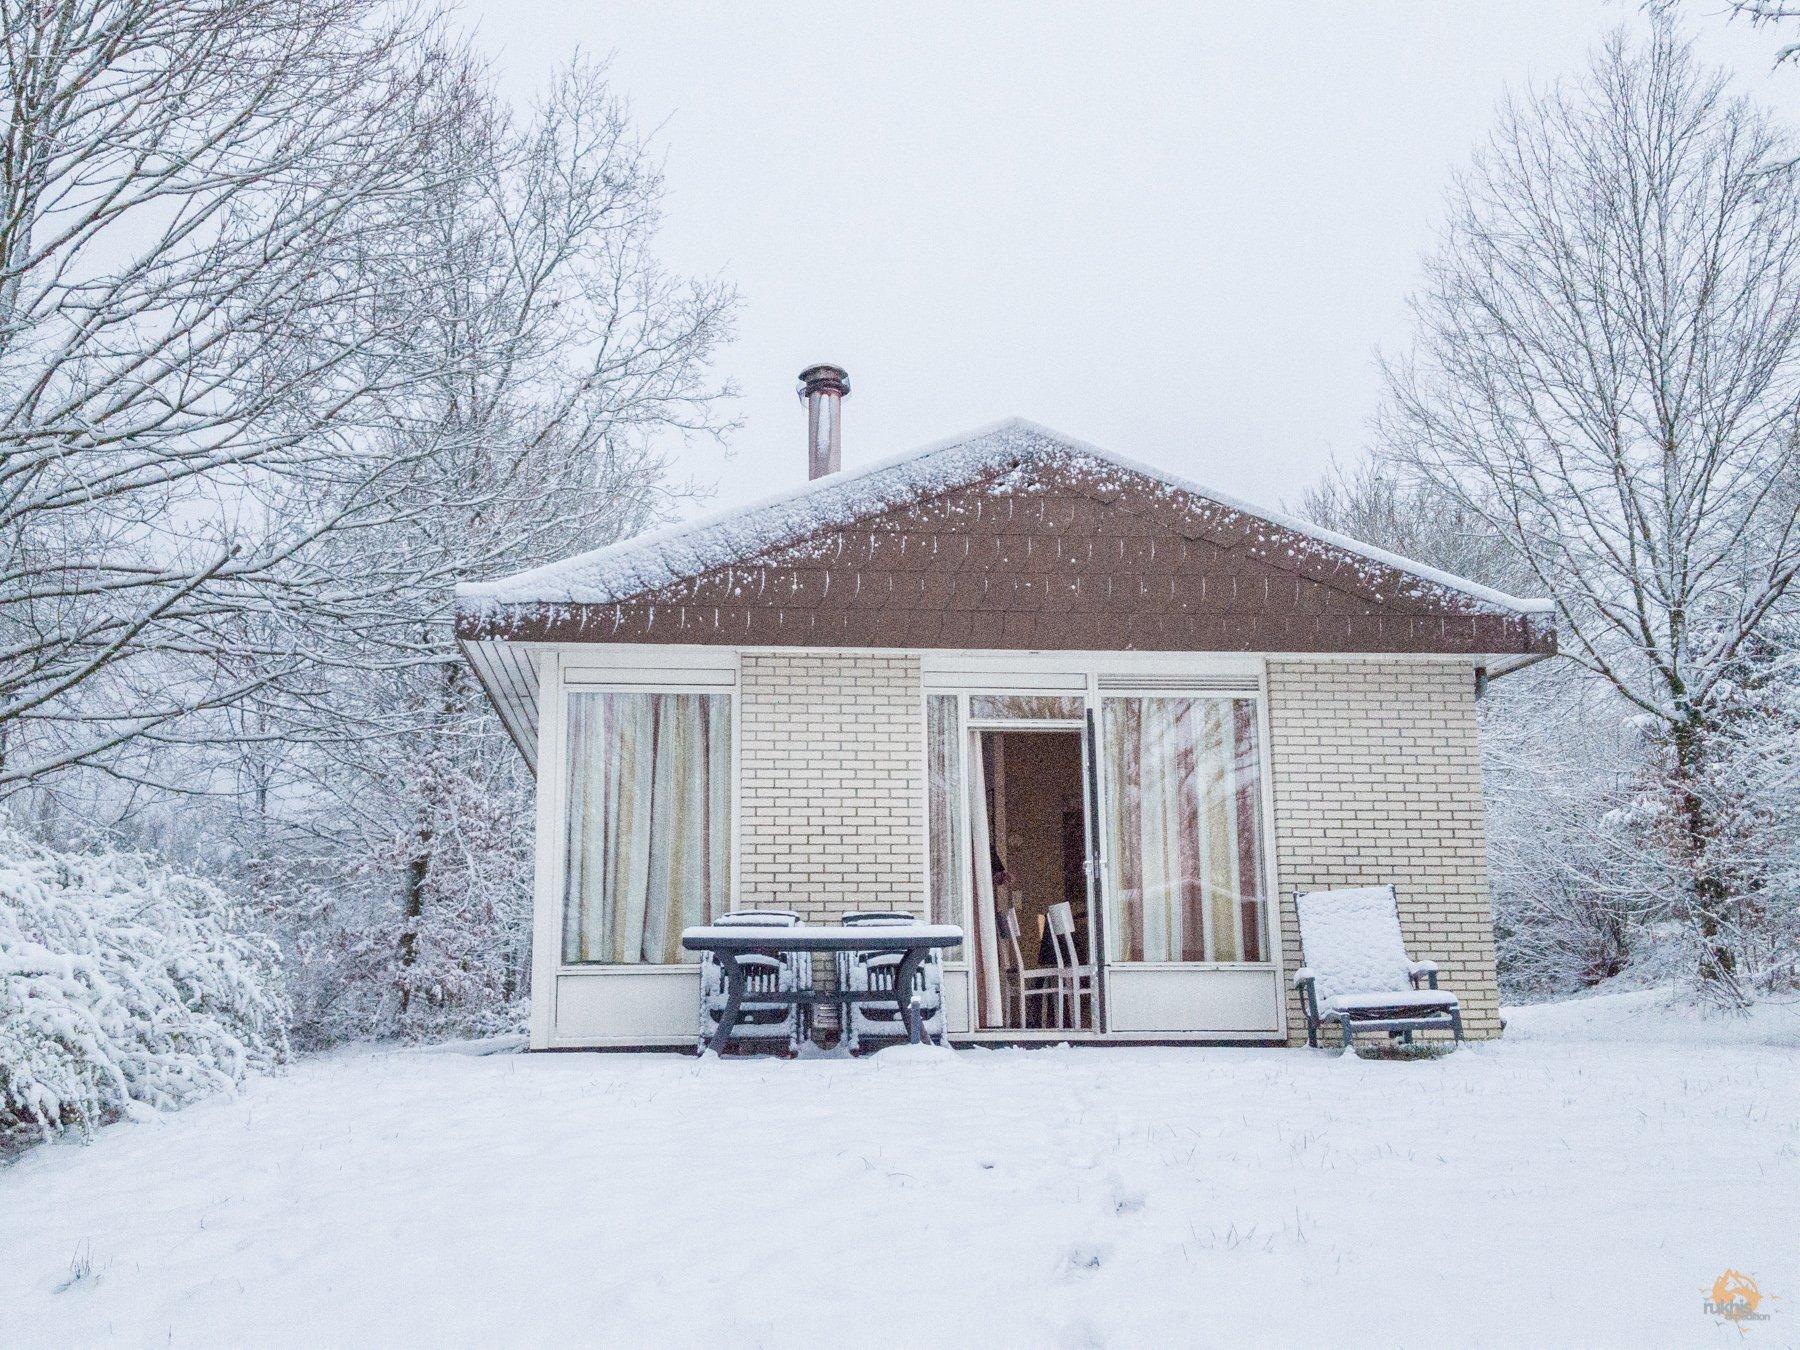 Ferienhaus im Landal Hochwald- Kell am See - Rheinland Pfalz